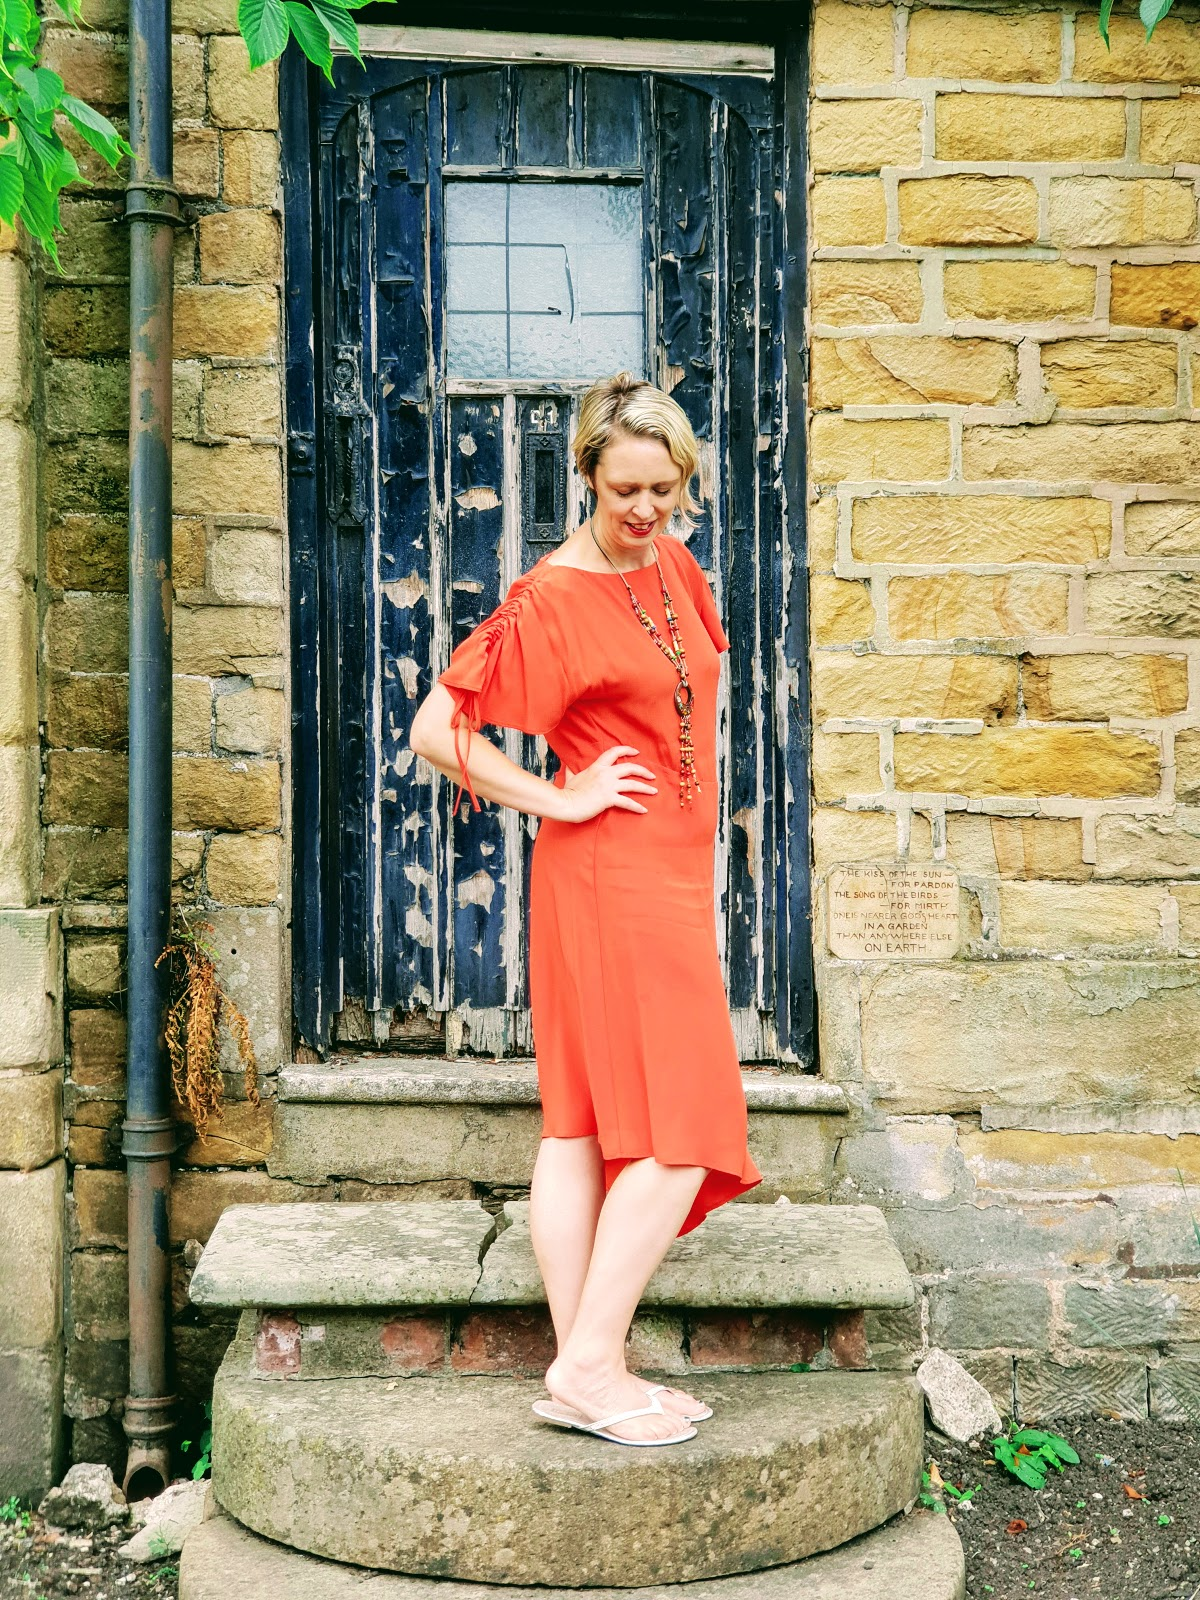 My Favourite Orange Dress: Over 40 Style